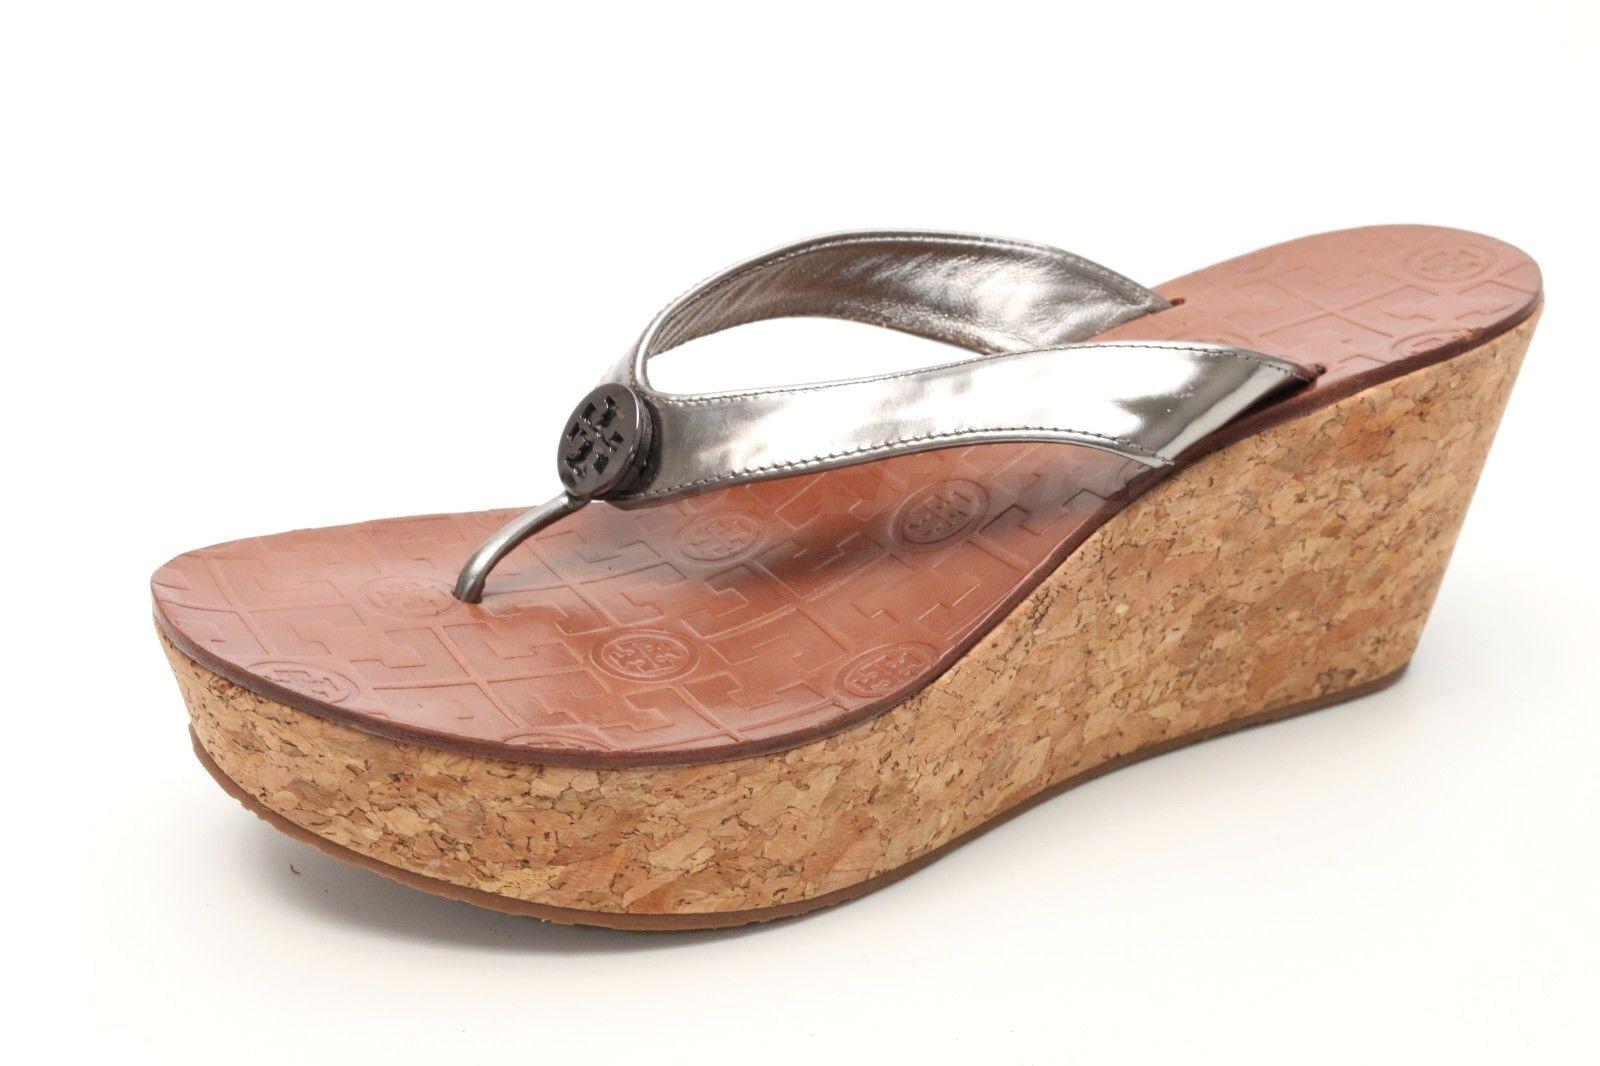 TORY BURCH Thora Thora BURCH 1871 Silver Patent Leder Wedge Flip Flop Thong  Schuhes 9.5 M 4316da